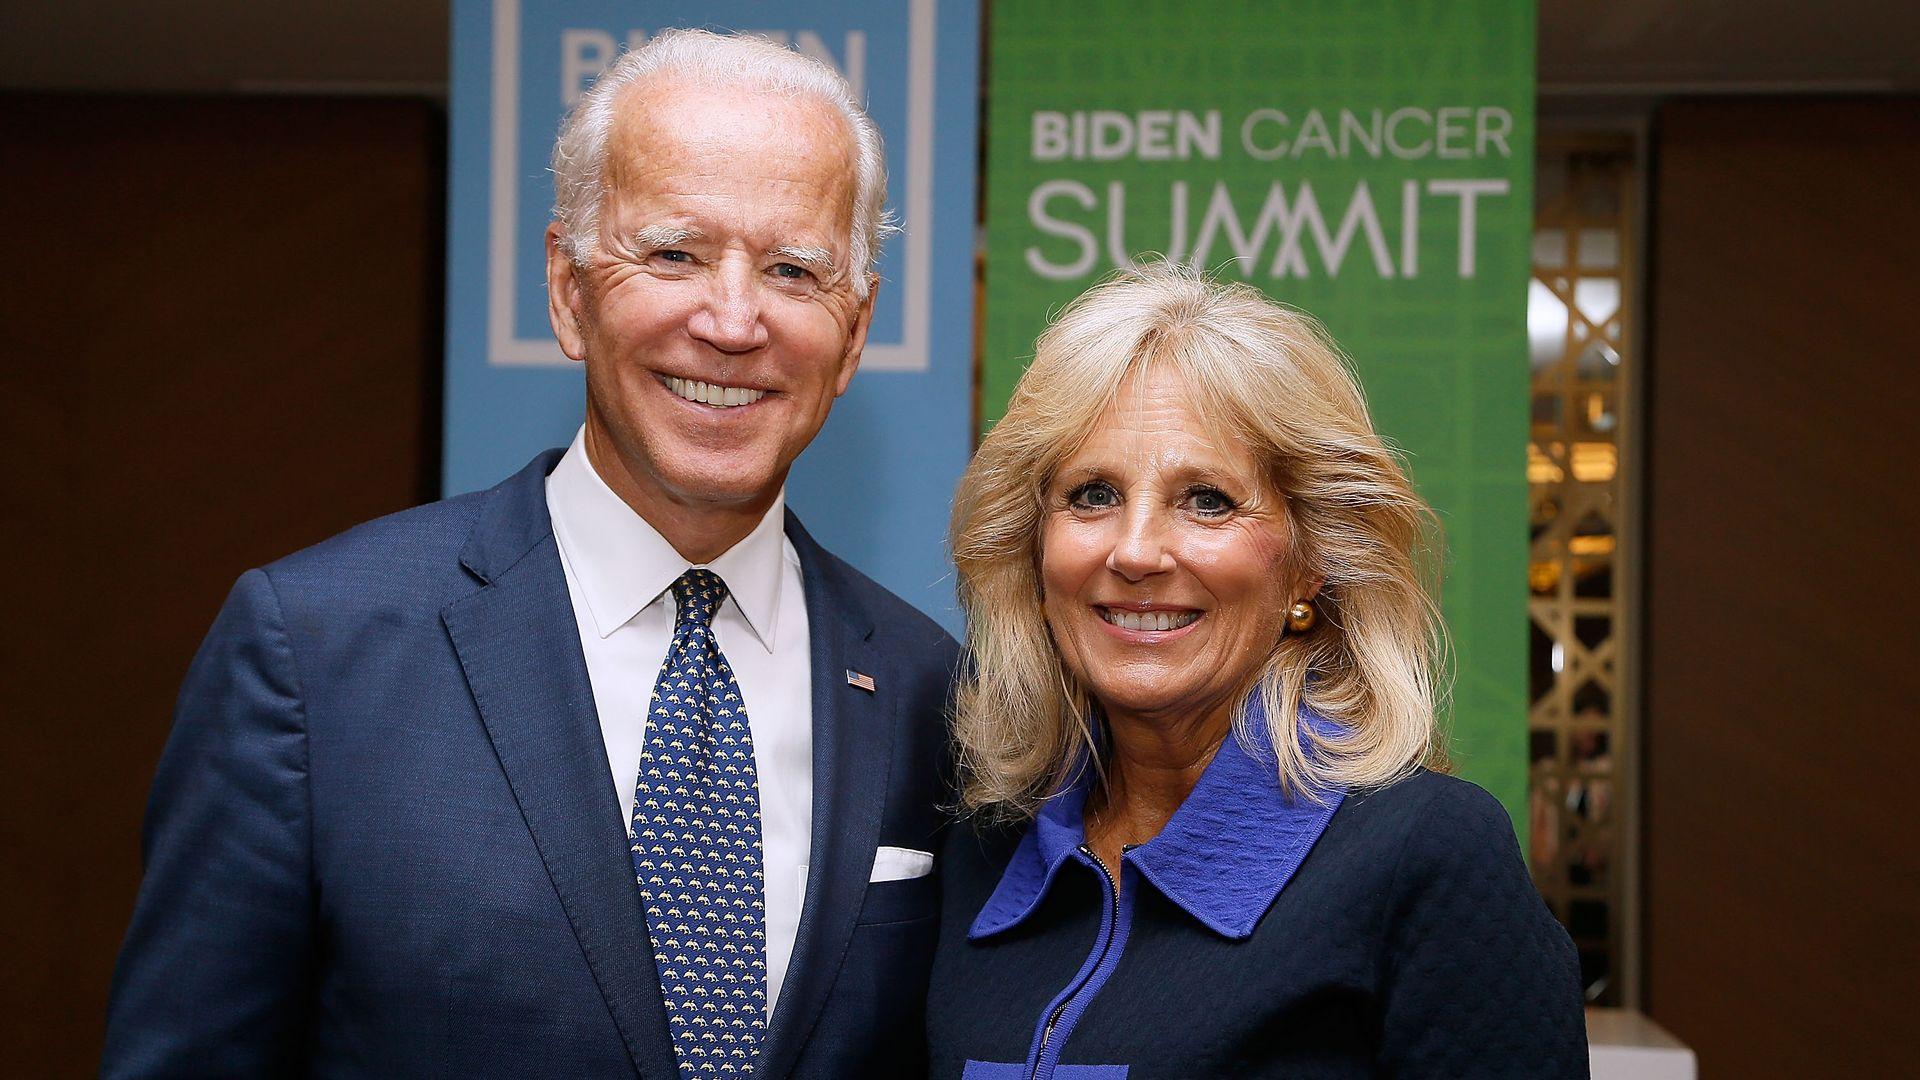 Former U.S. Vice President Joe Biden and his wife, Dr. Jill Biden.